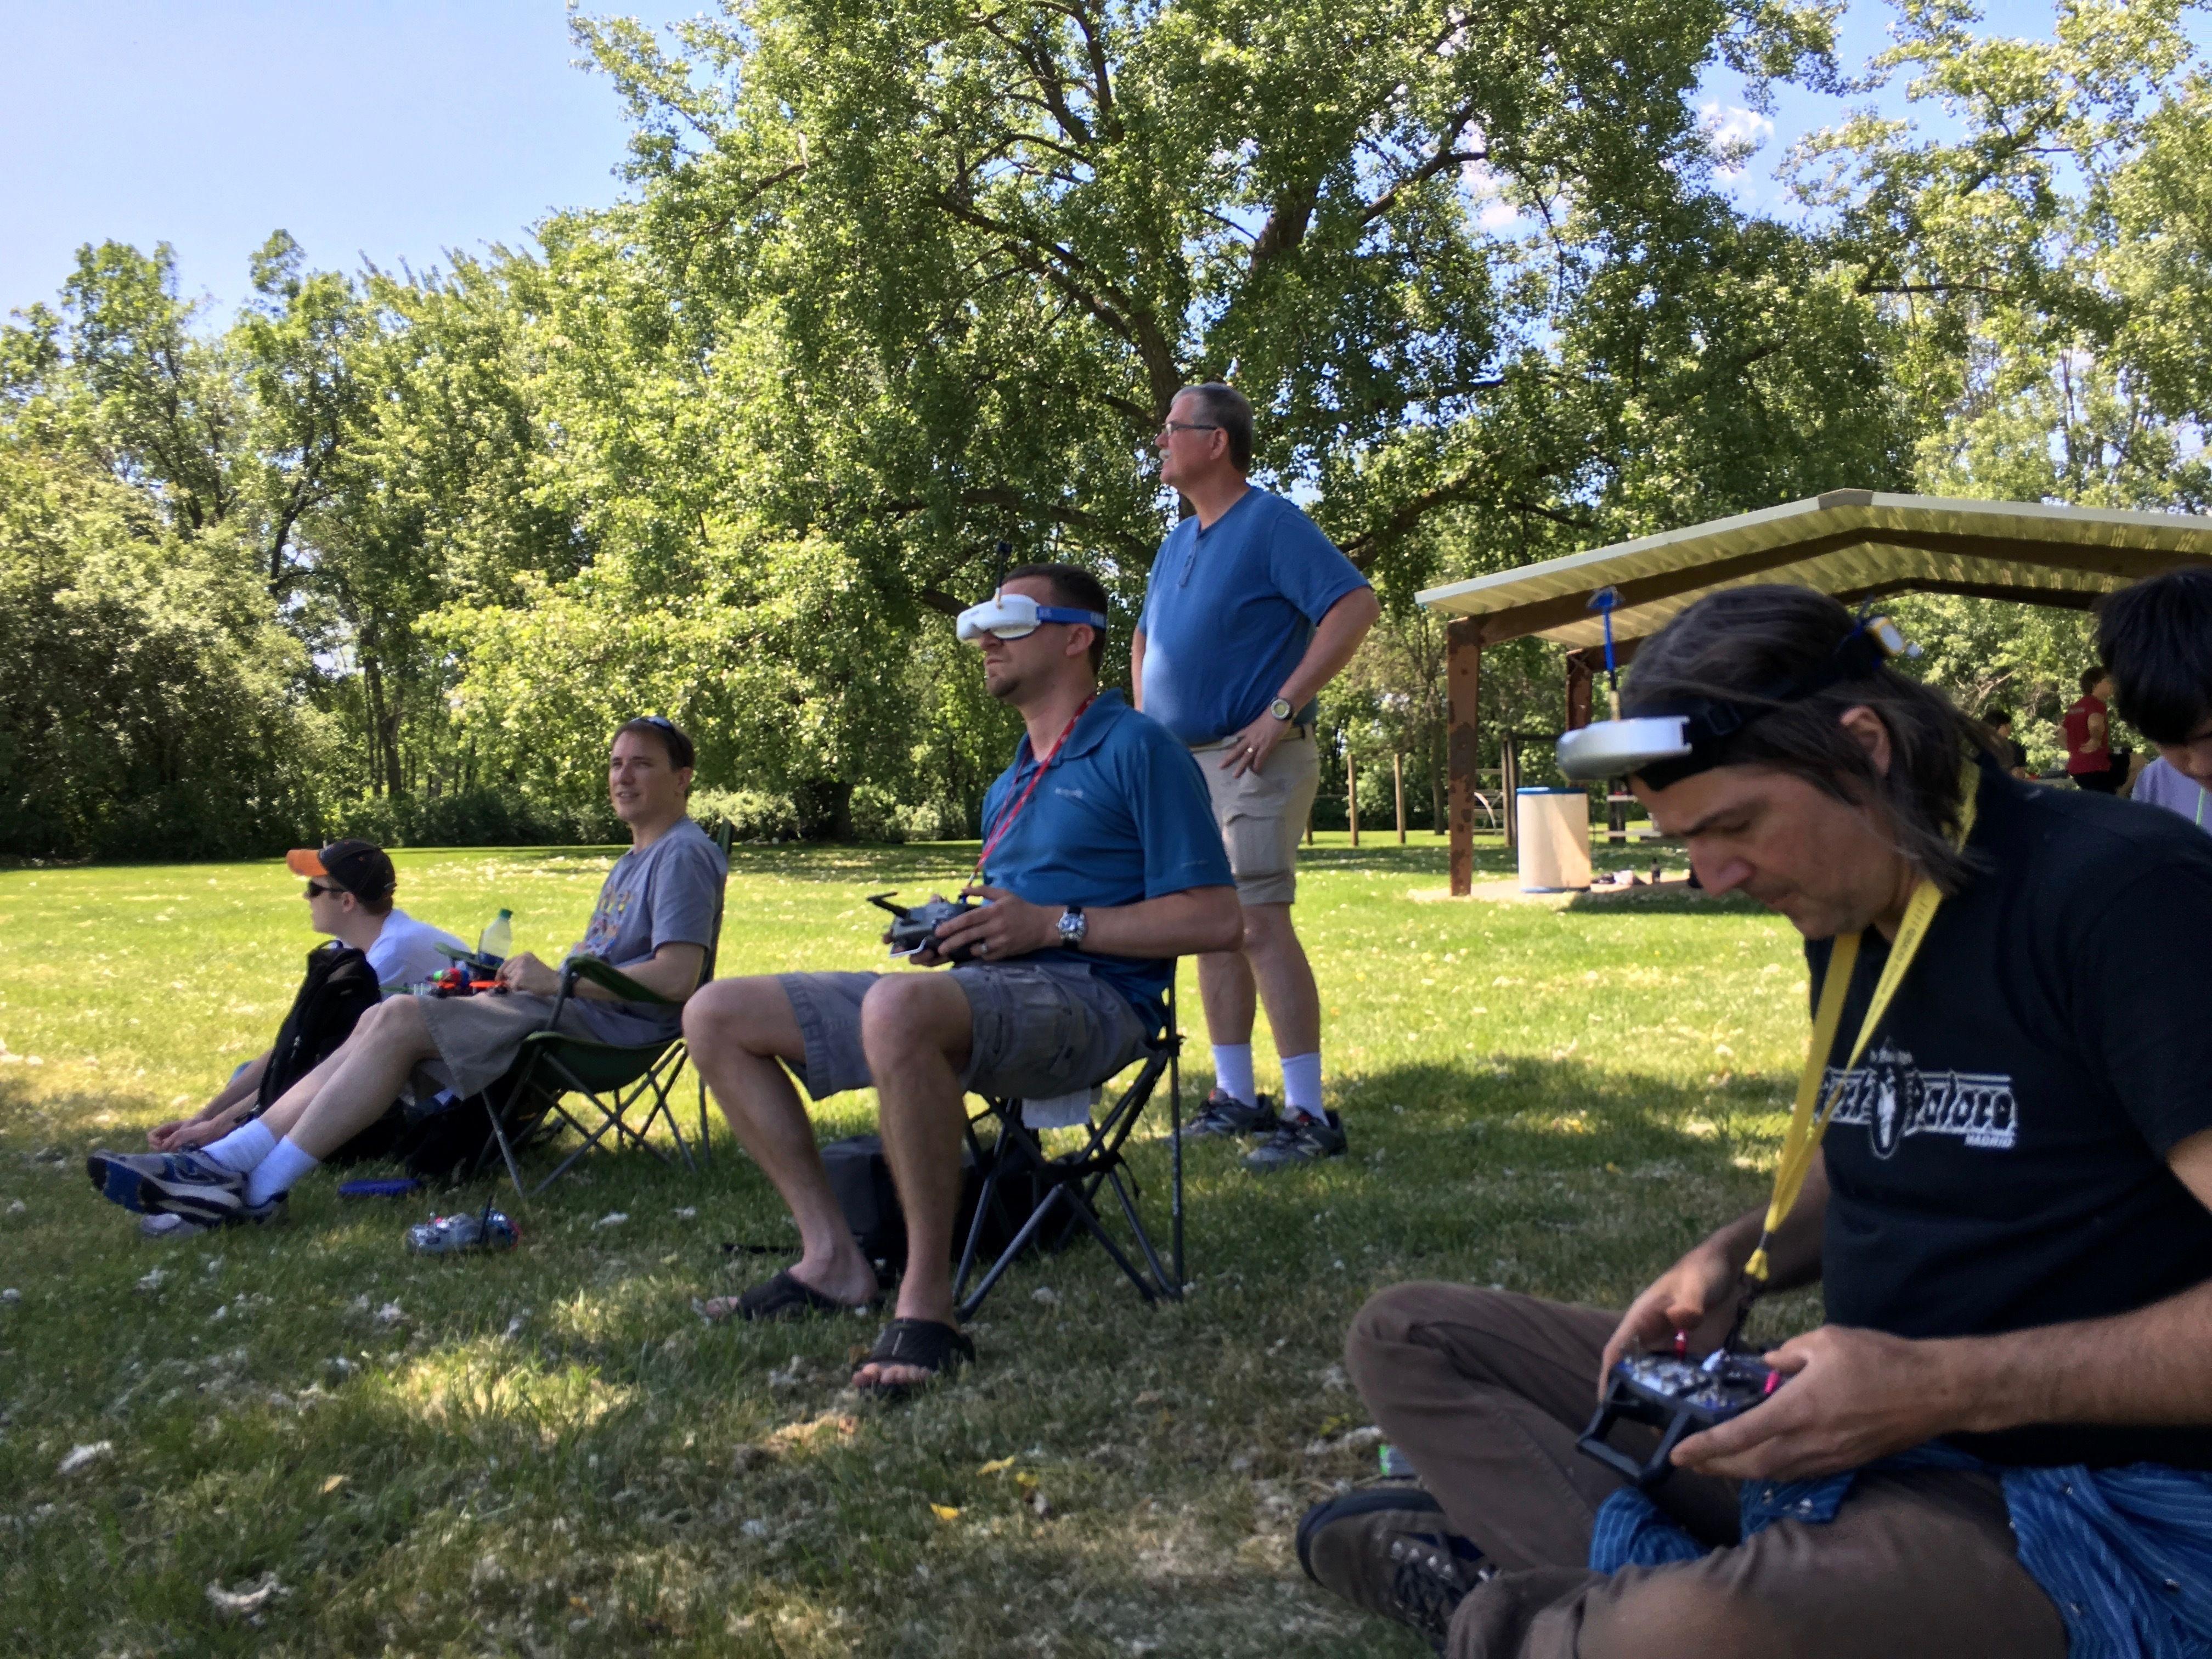 Minnesota Autonomous Vehicle Meetup